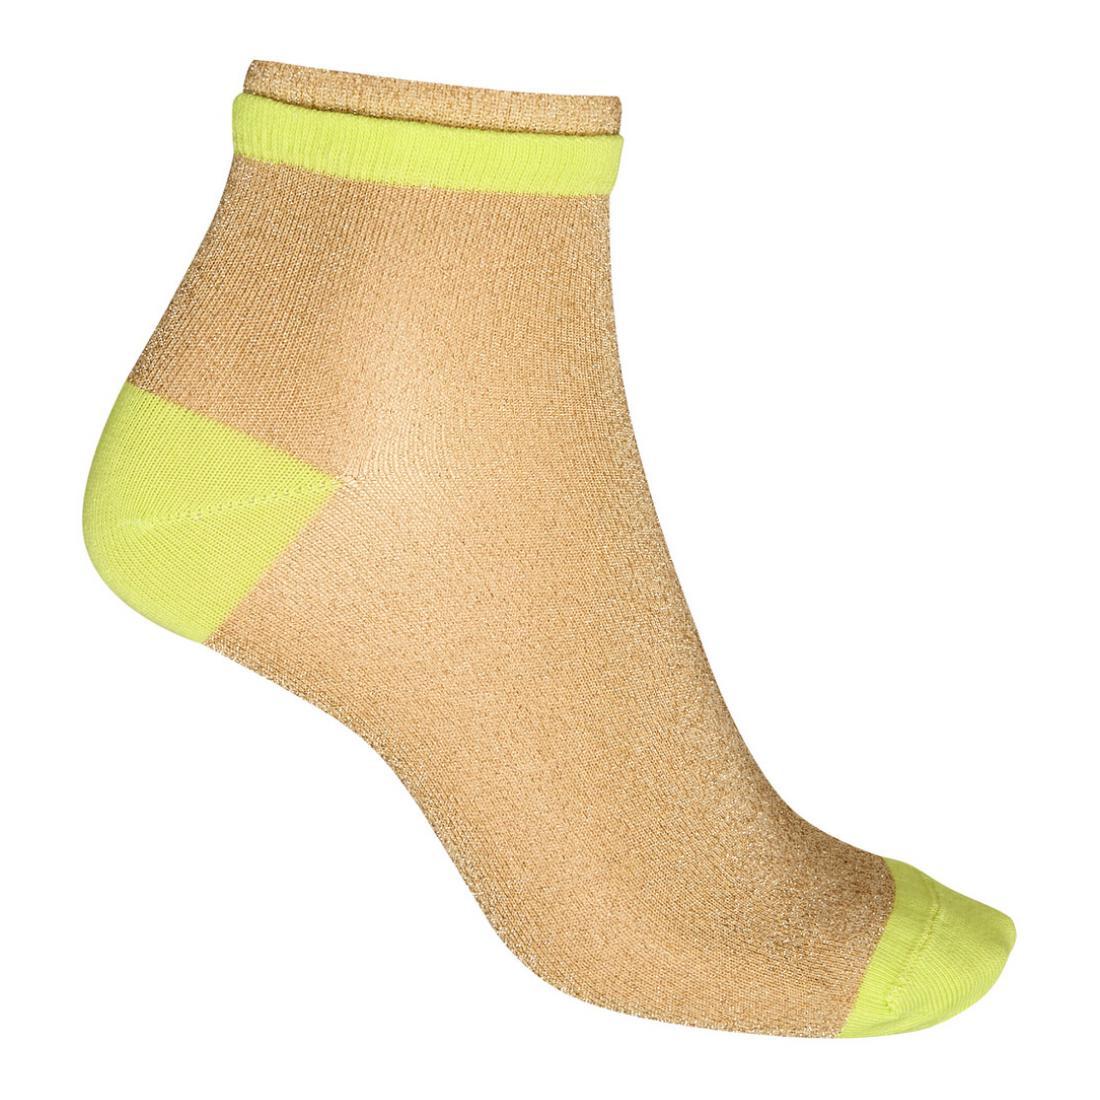 Opus Socken Damen Yeoni